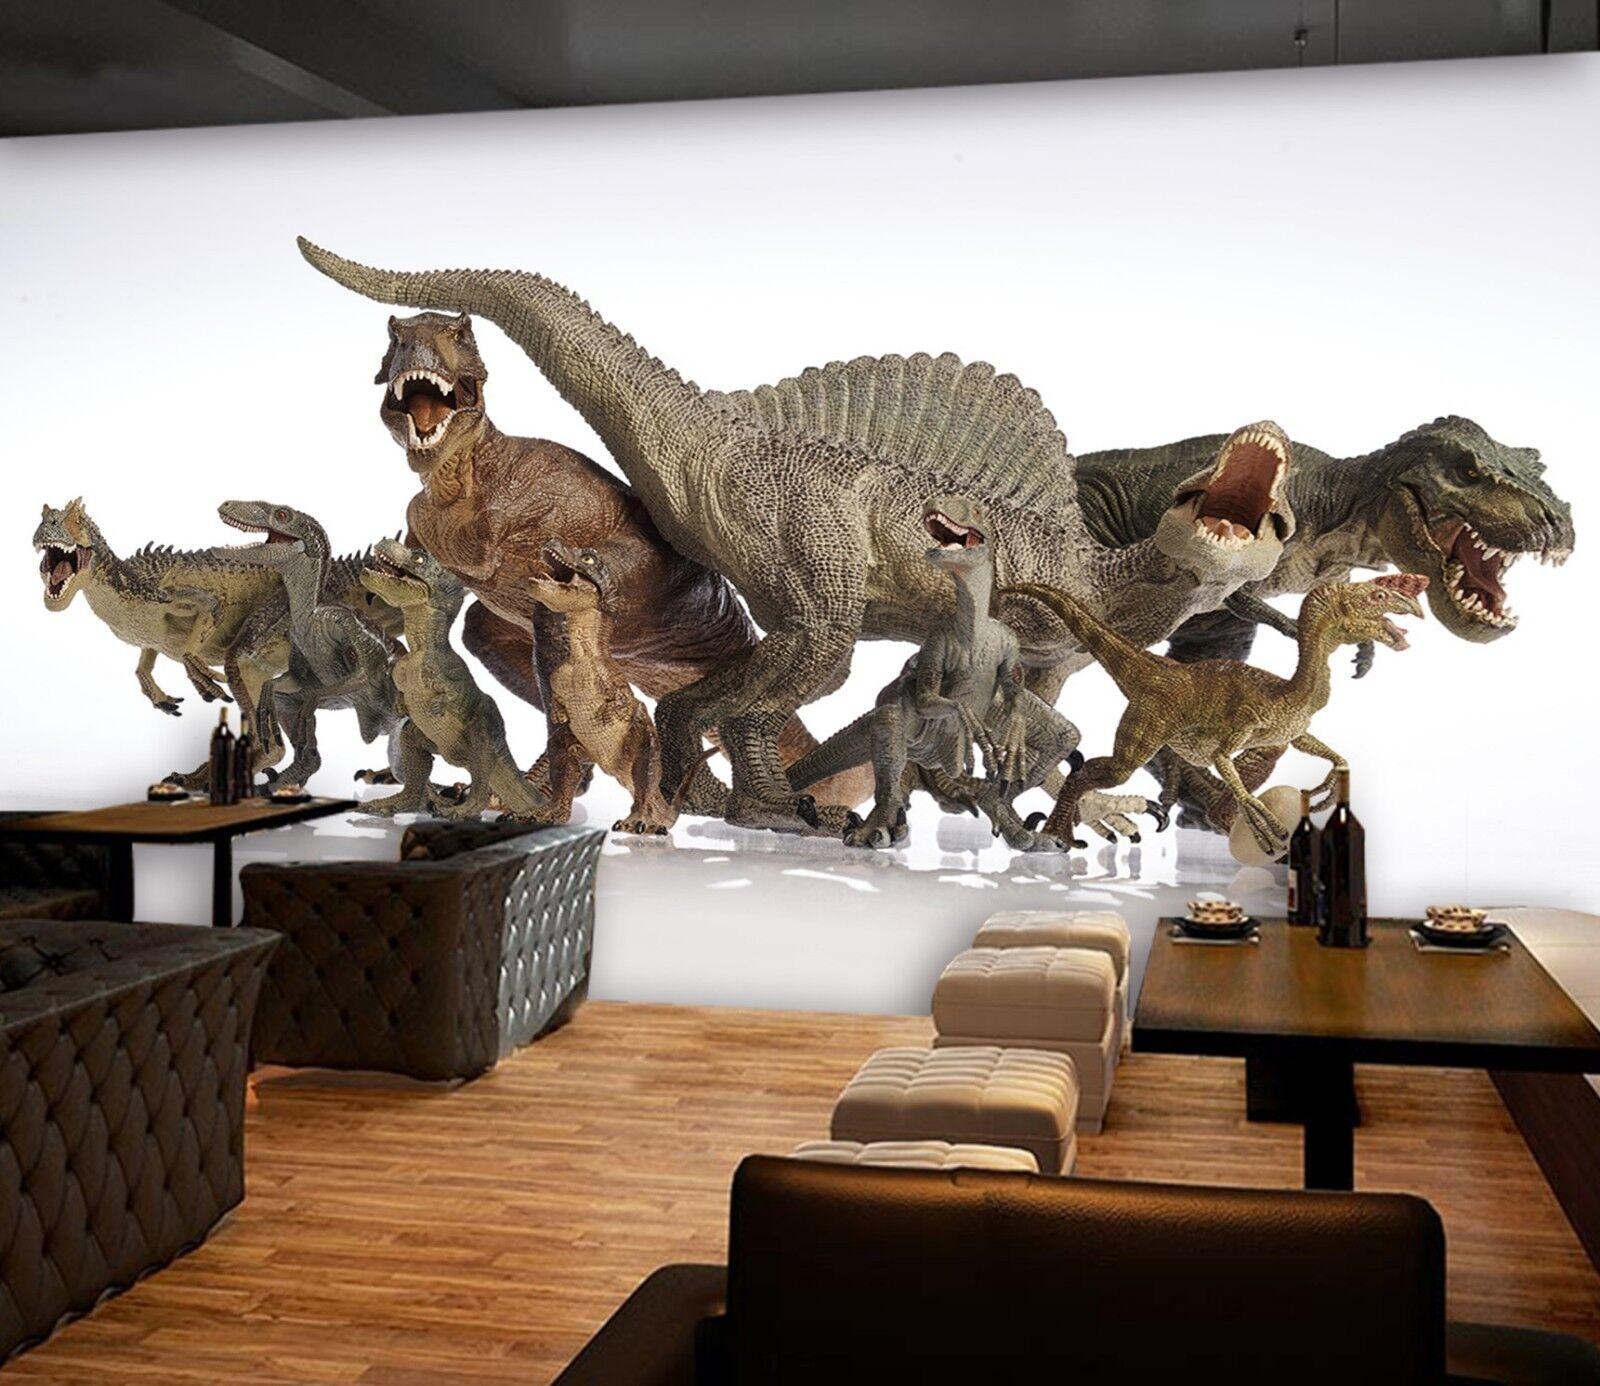 3D Dinosaur Group Picture 2 Wallpaper Mural Print Wall Indoor Wallpaper Murals